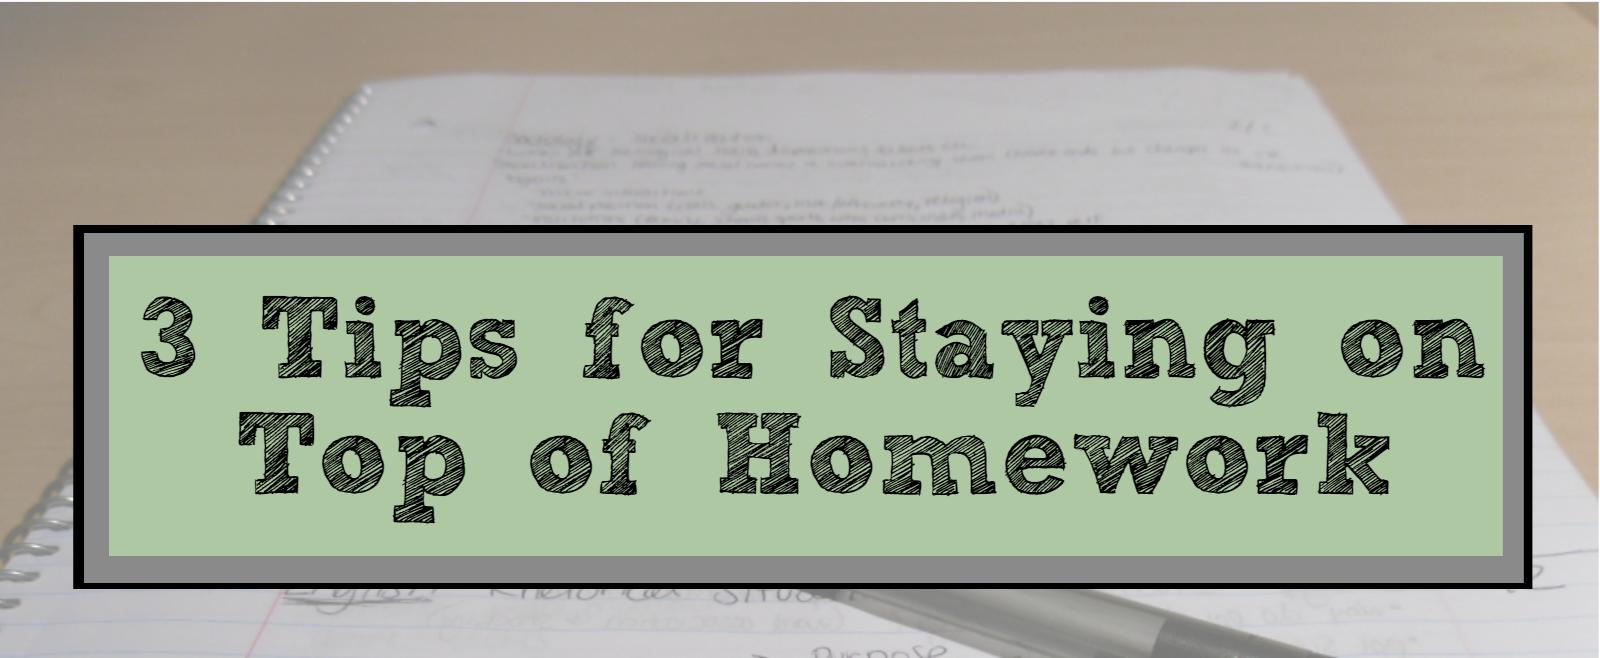 JJC homework tips